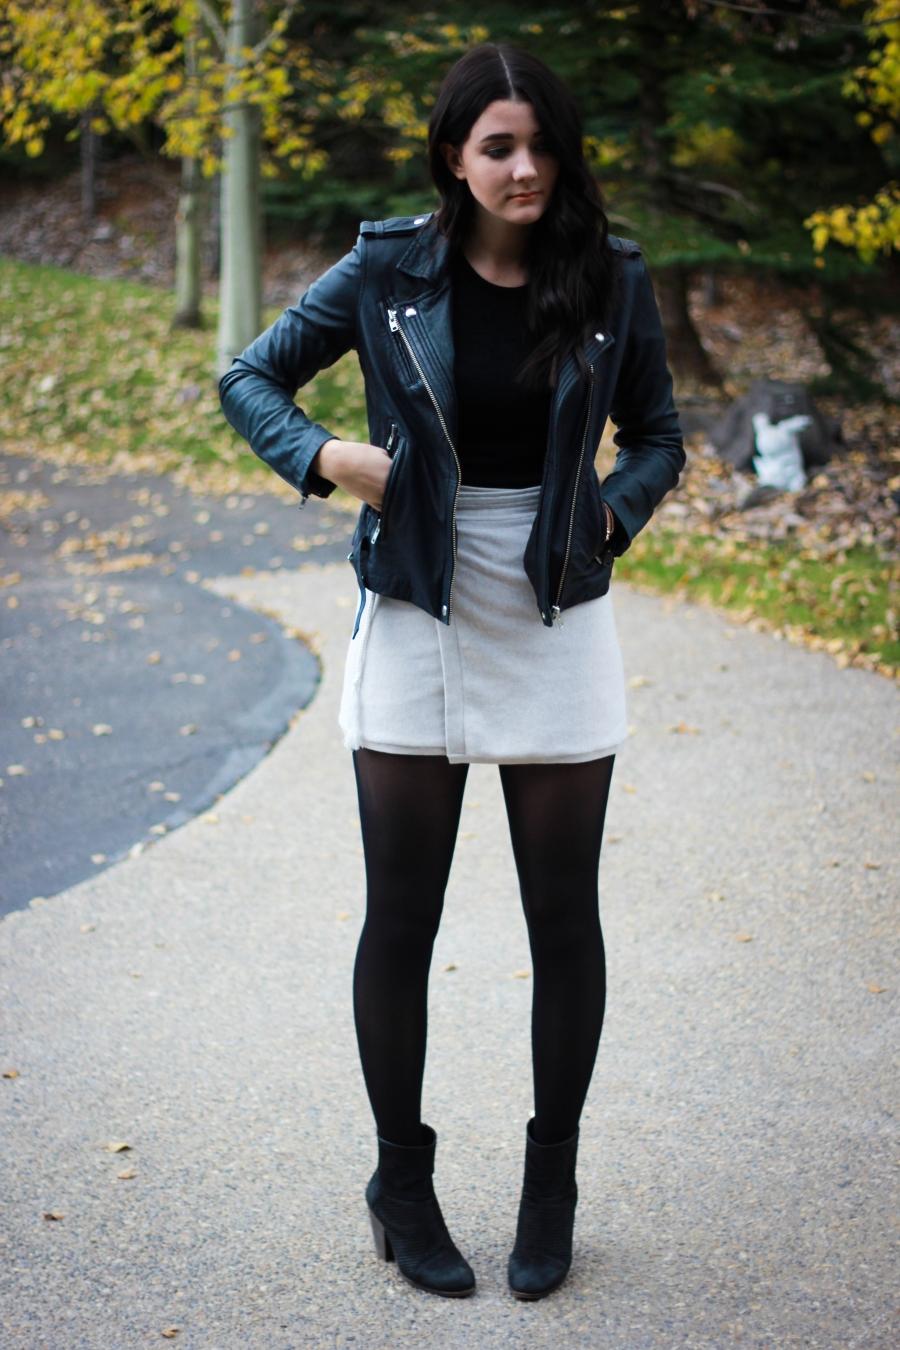 Wool Skirt (2 of 7)